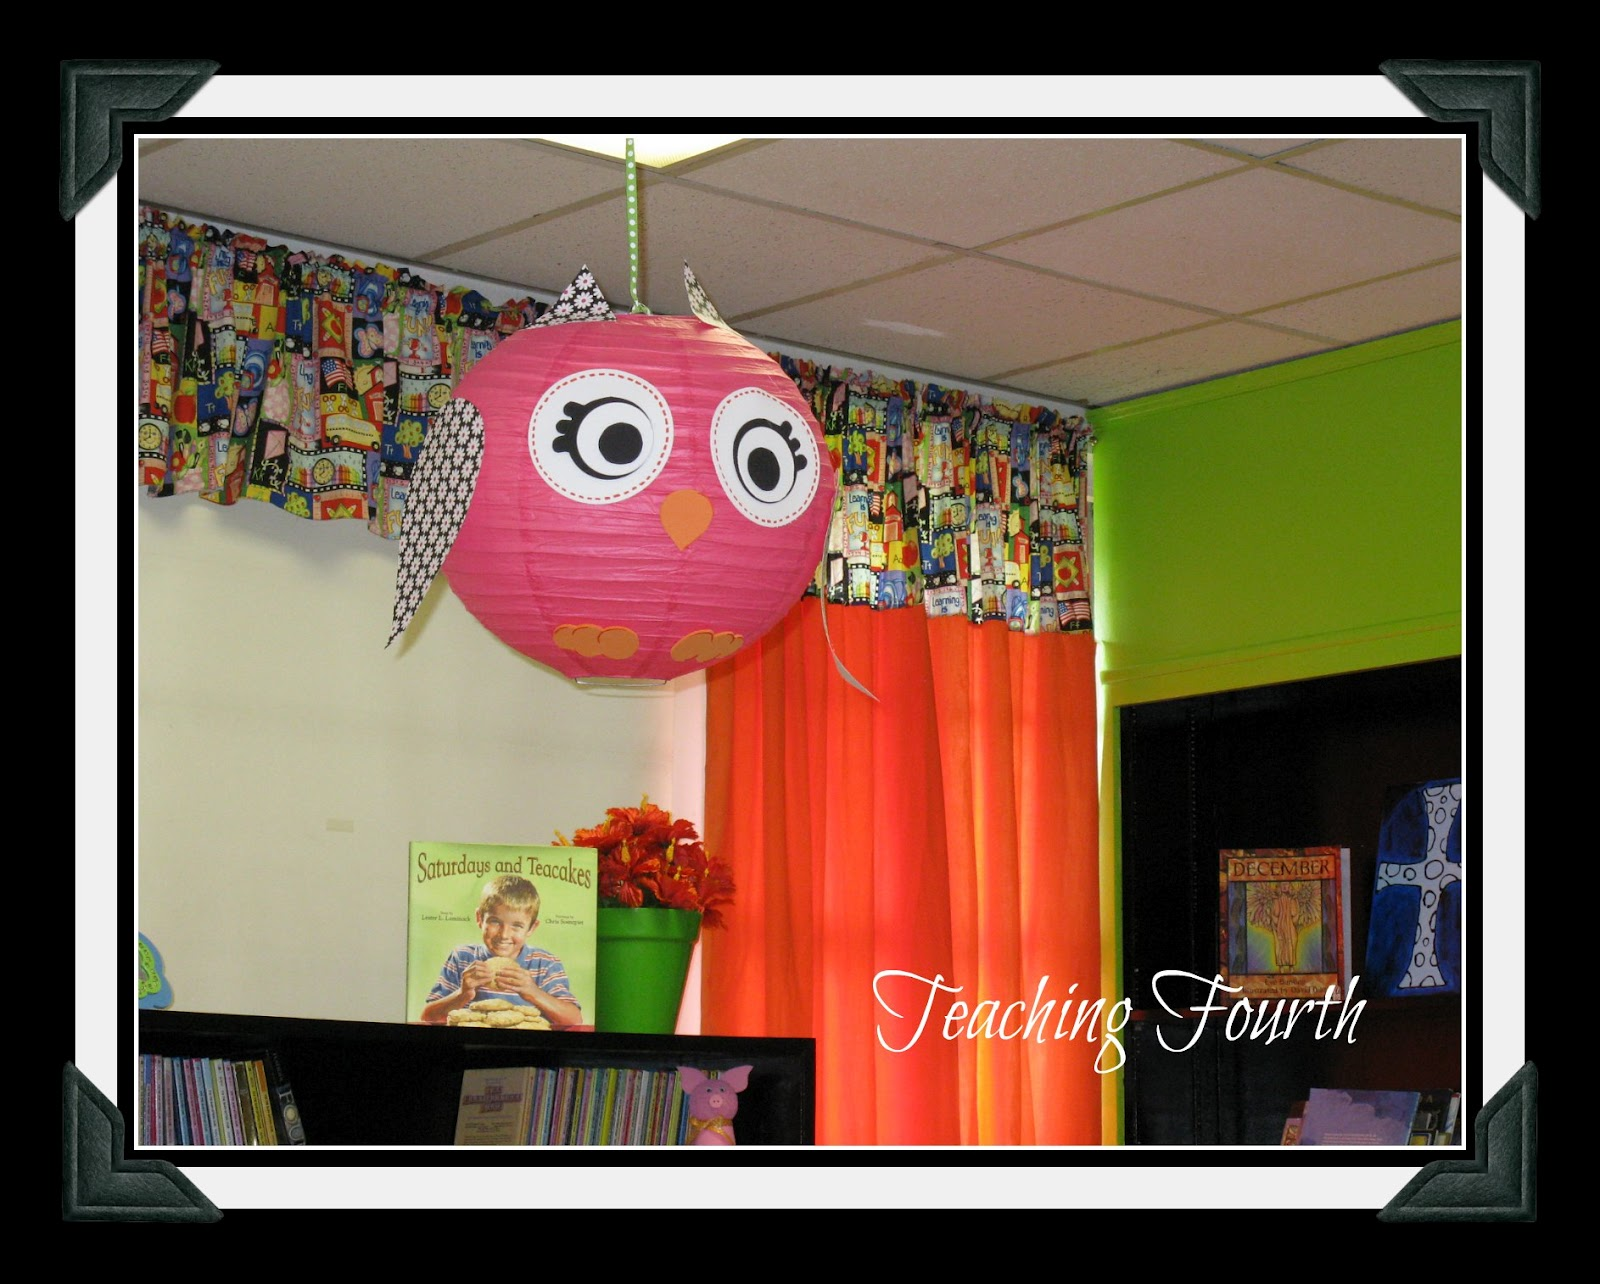 Japanese Classroom Decor : Teaching fourth sorry i fibbed more classroom